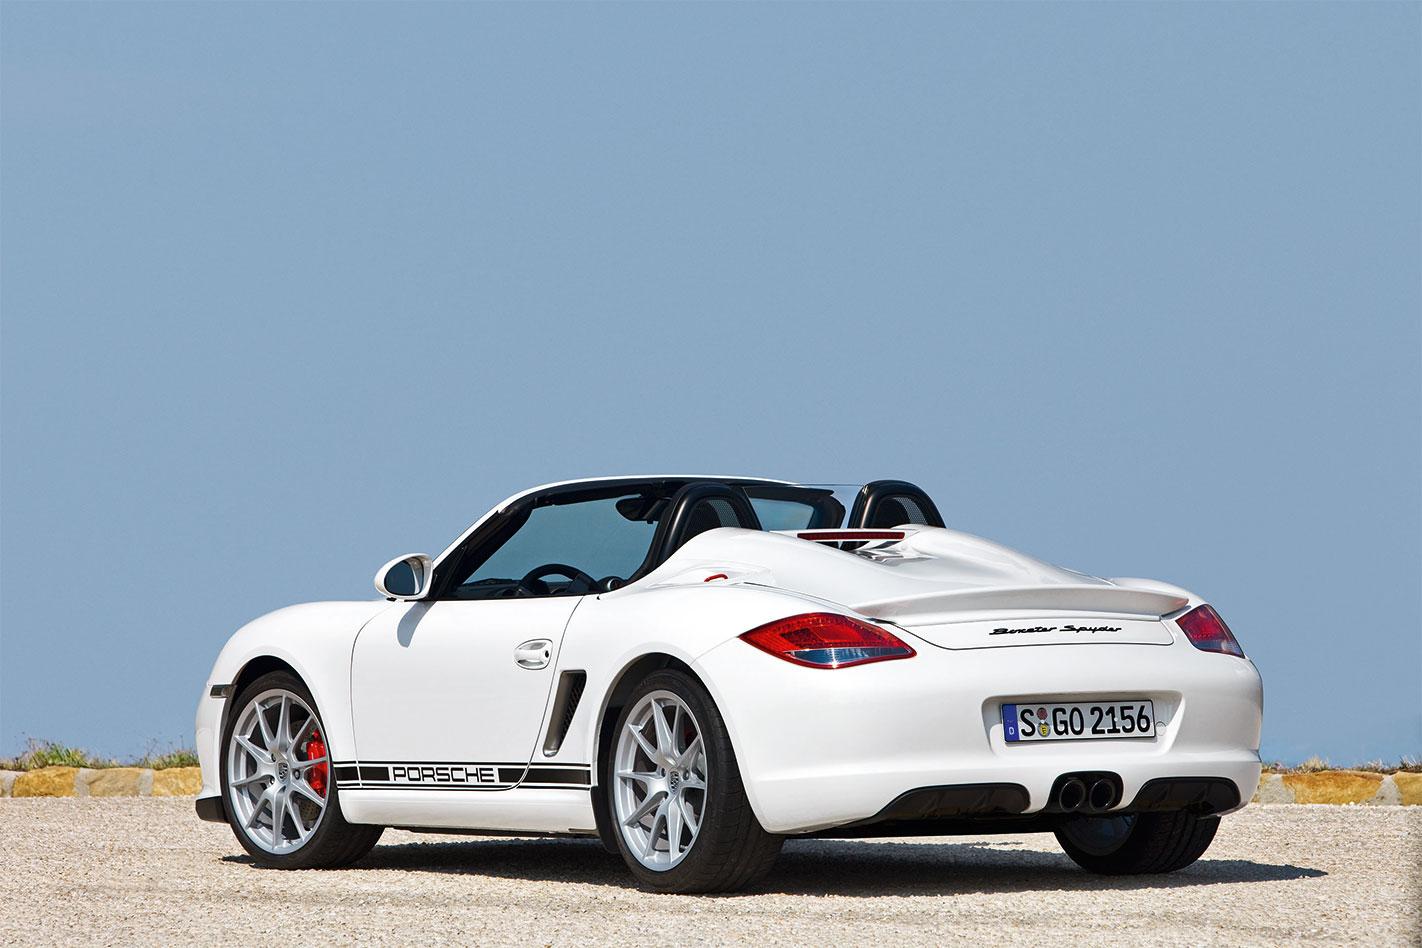 Porsche -Boxster -Spyder